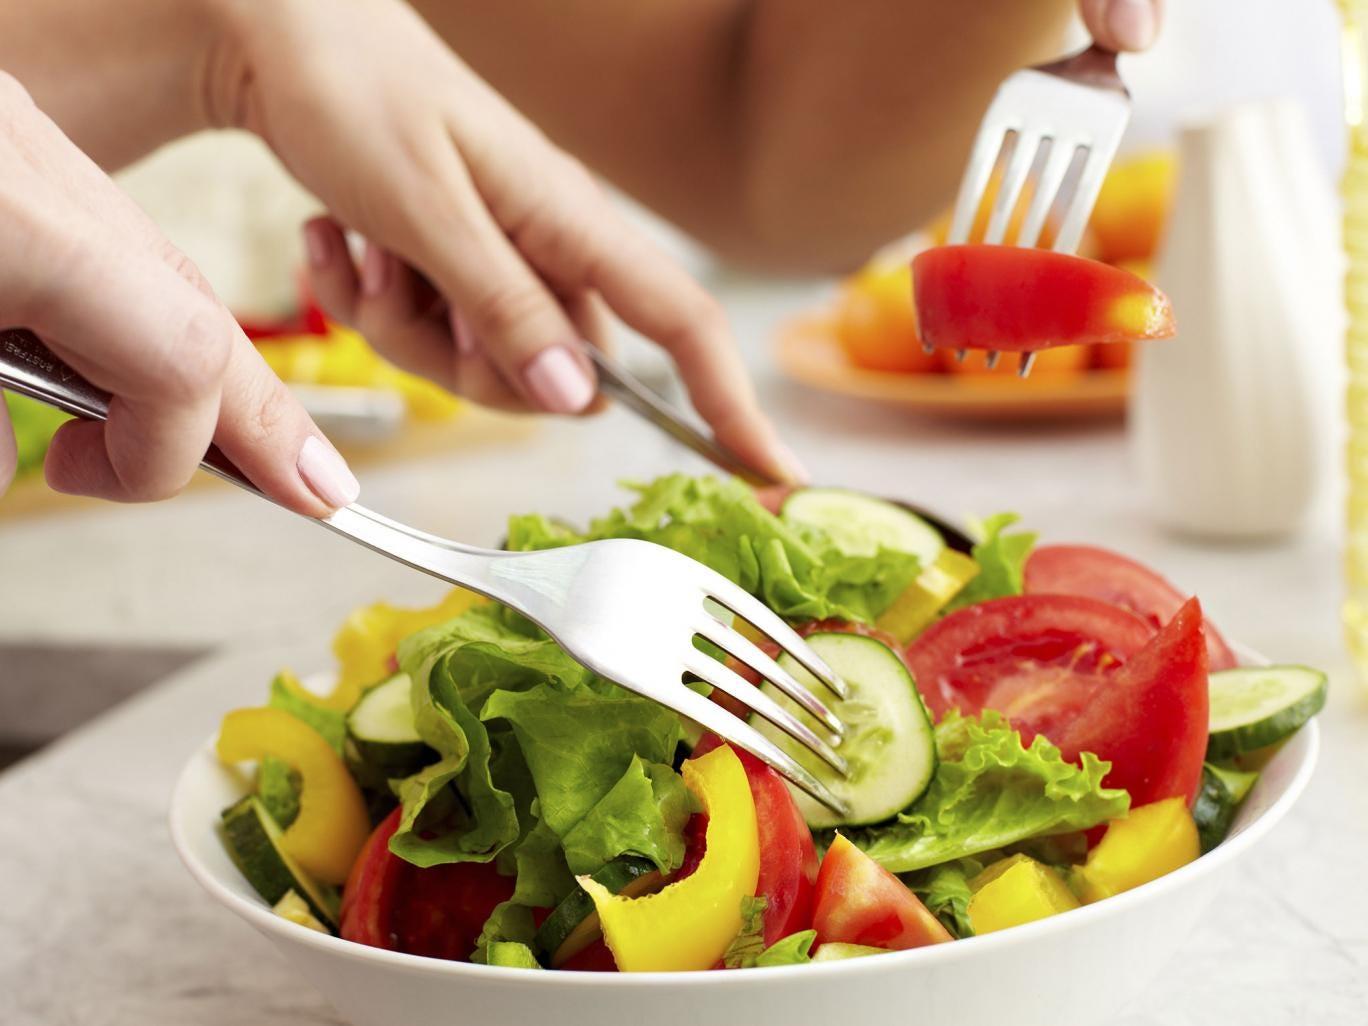 Calorie restriction could prevent triple negative breast cancers